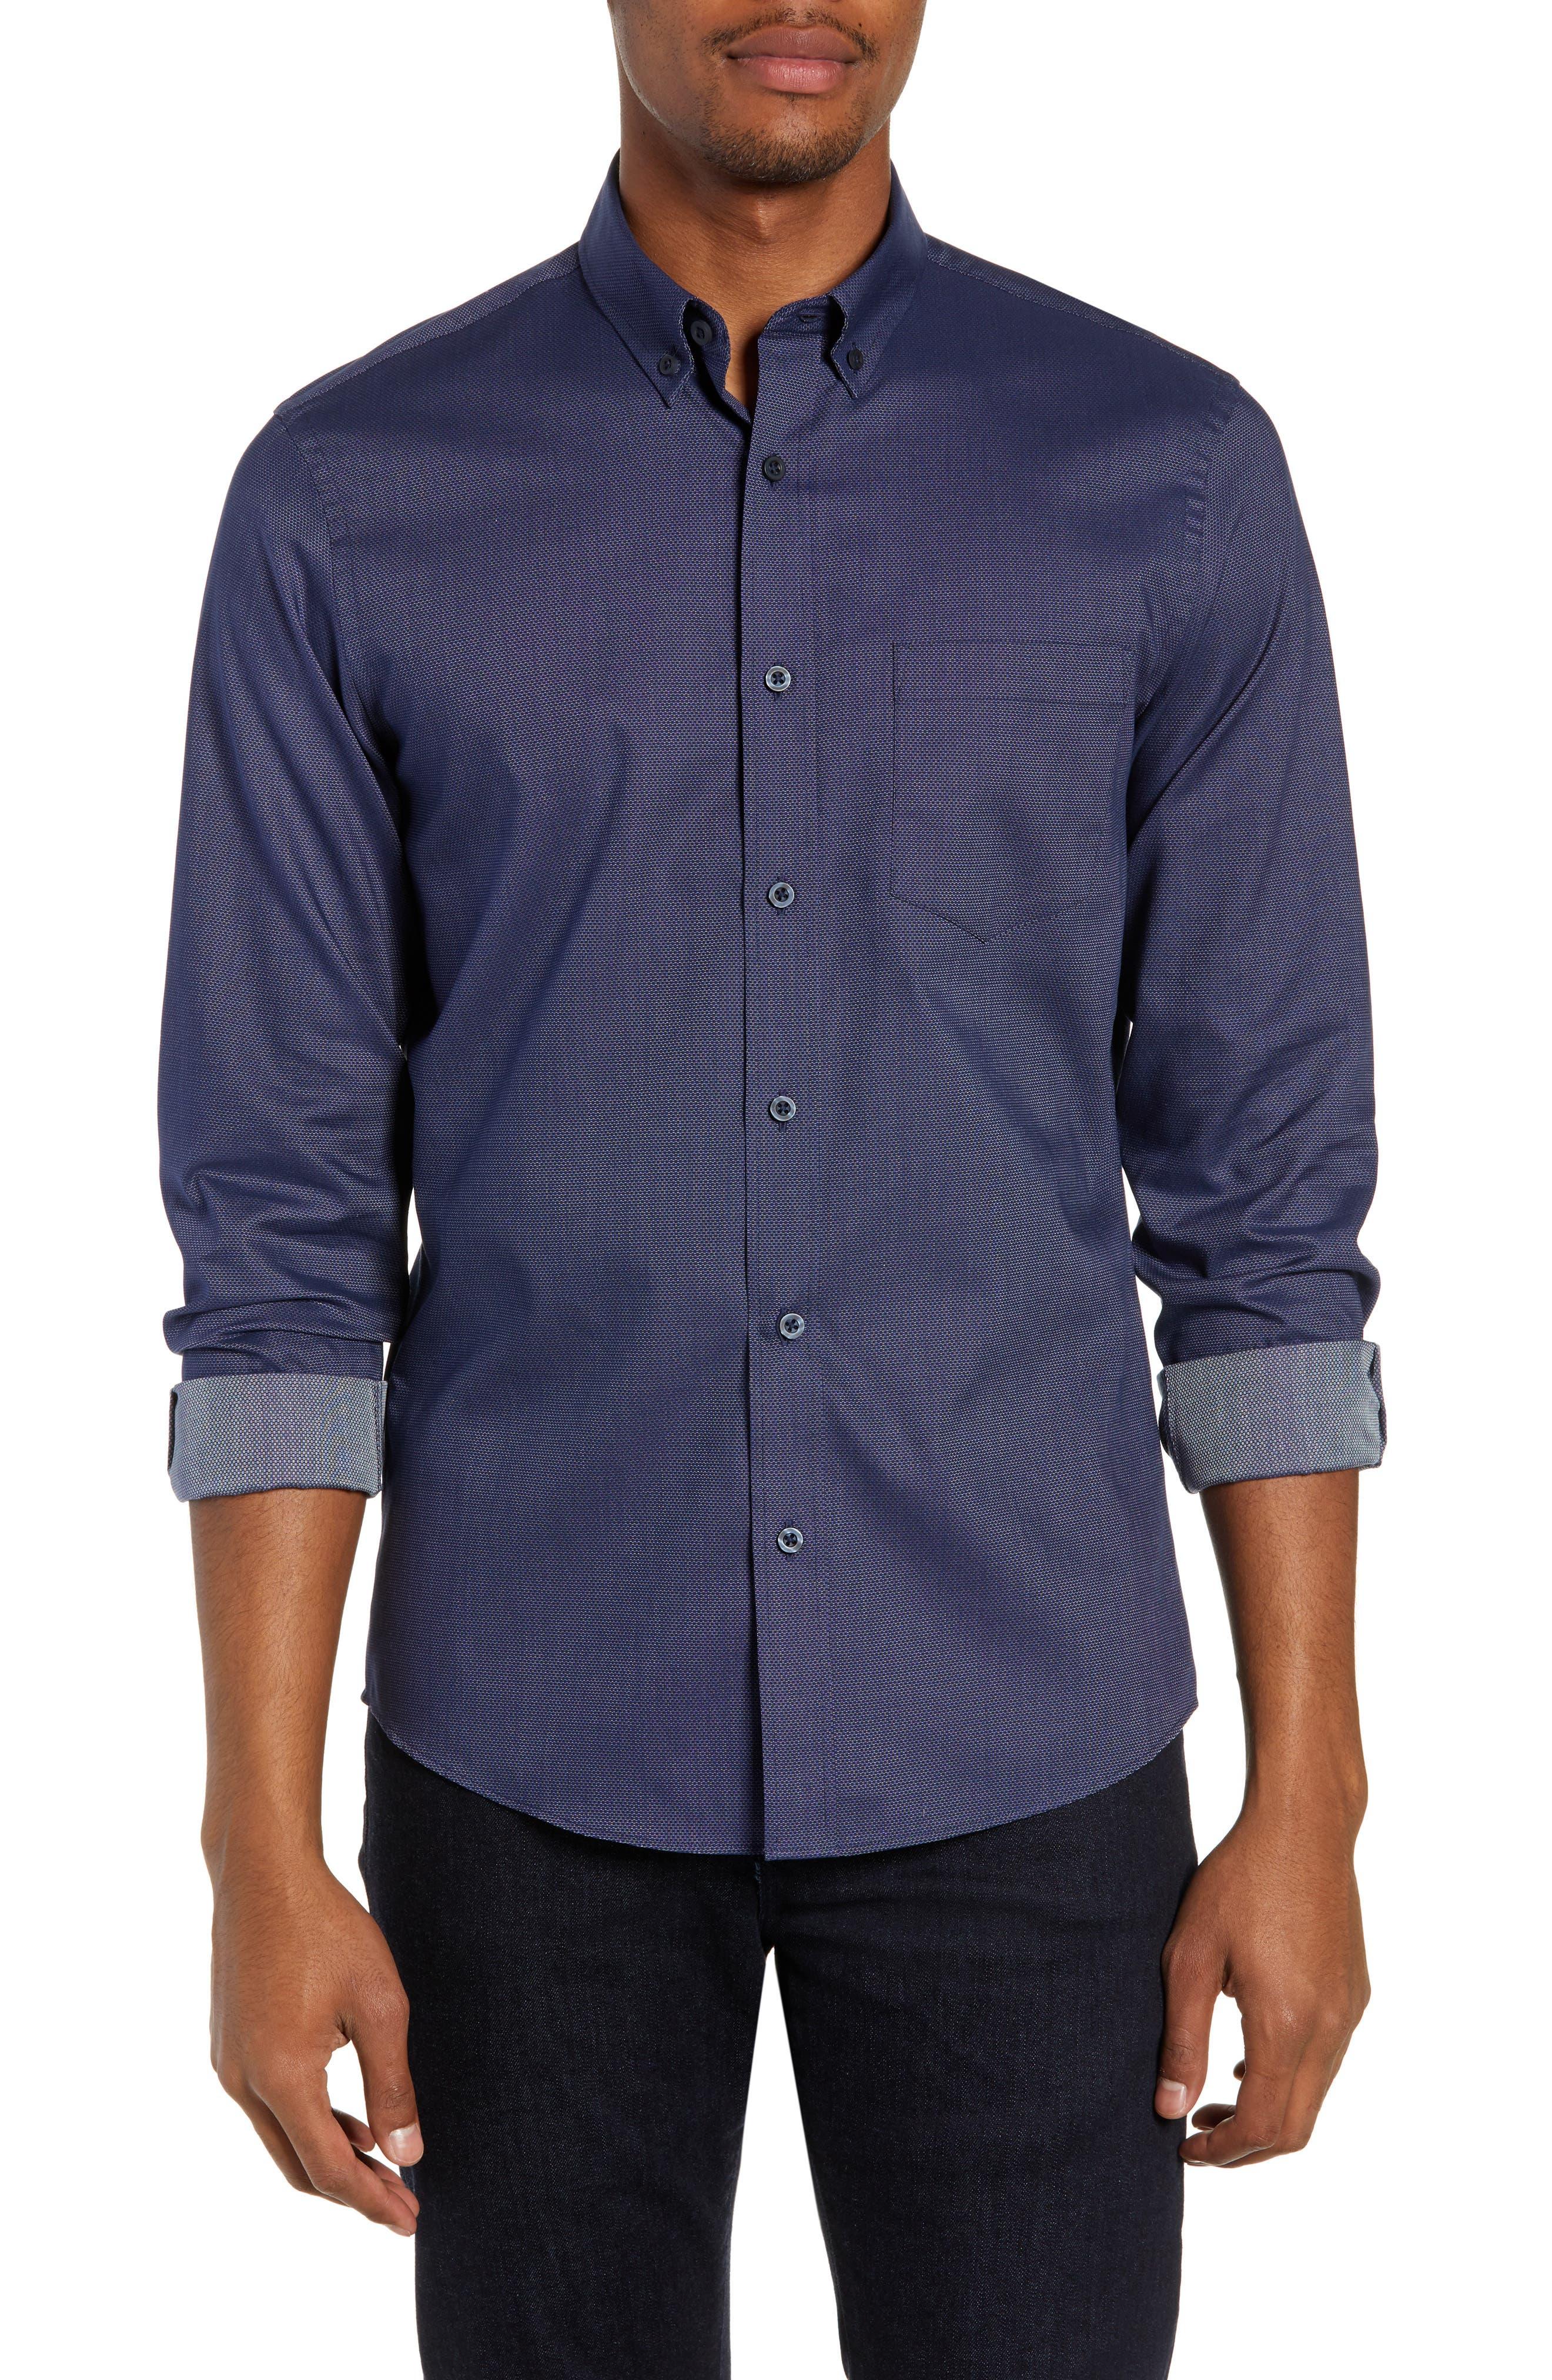 Nordstrom Shop Traditional Fit Sport Shirt, Blue